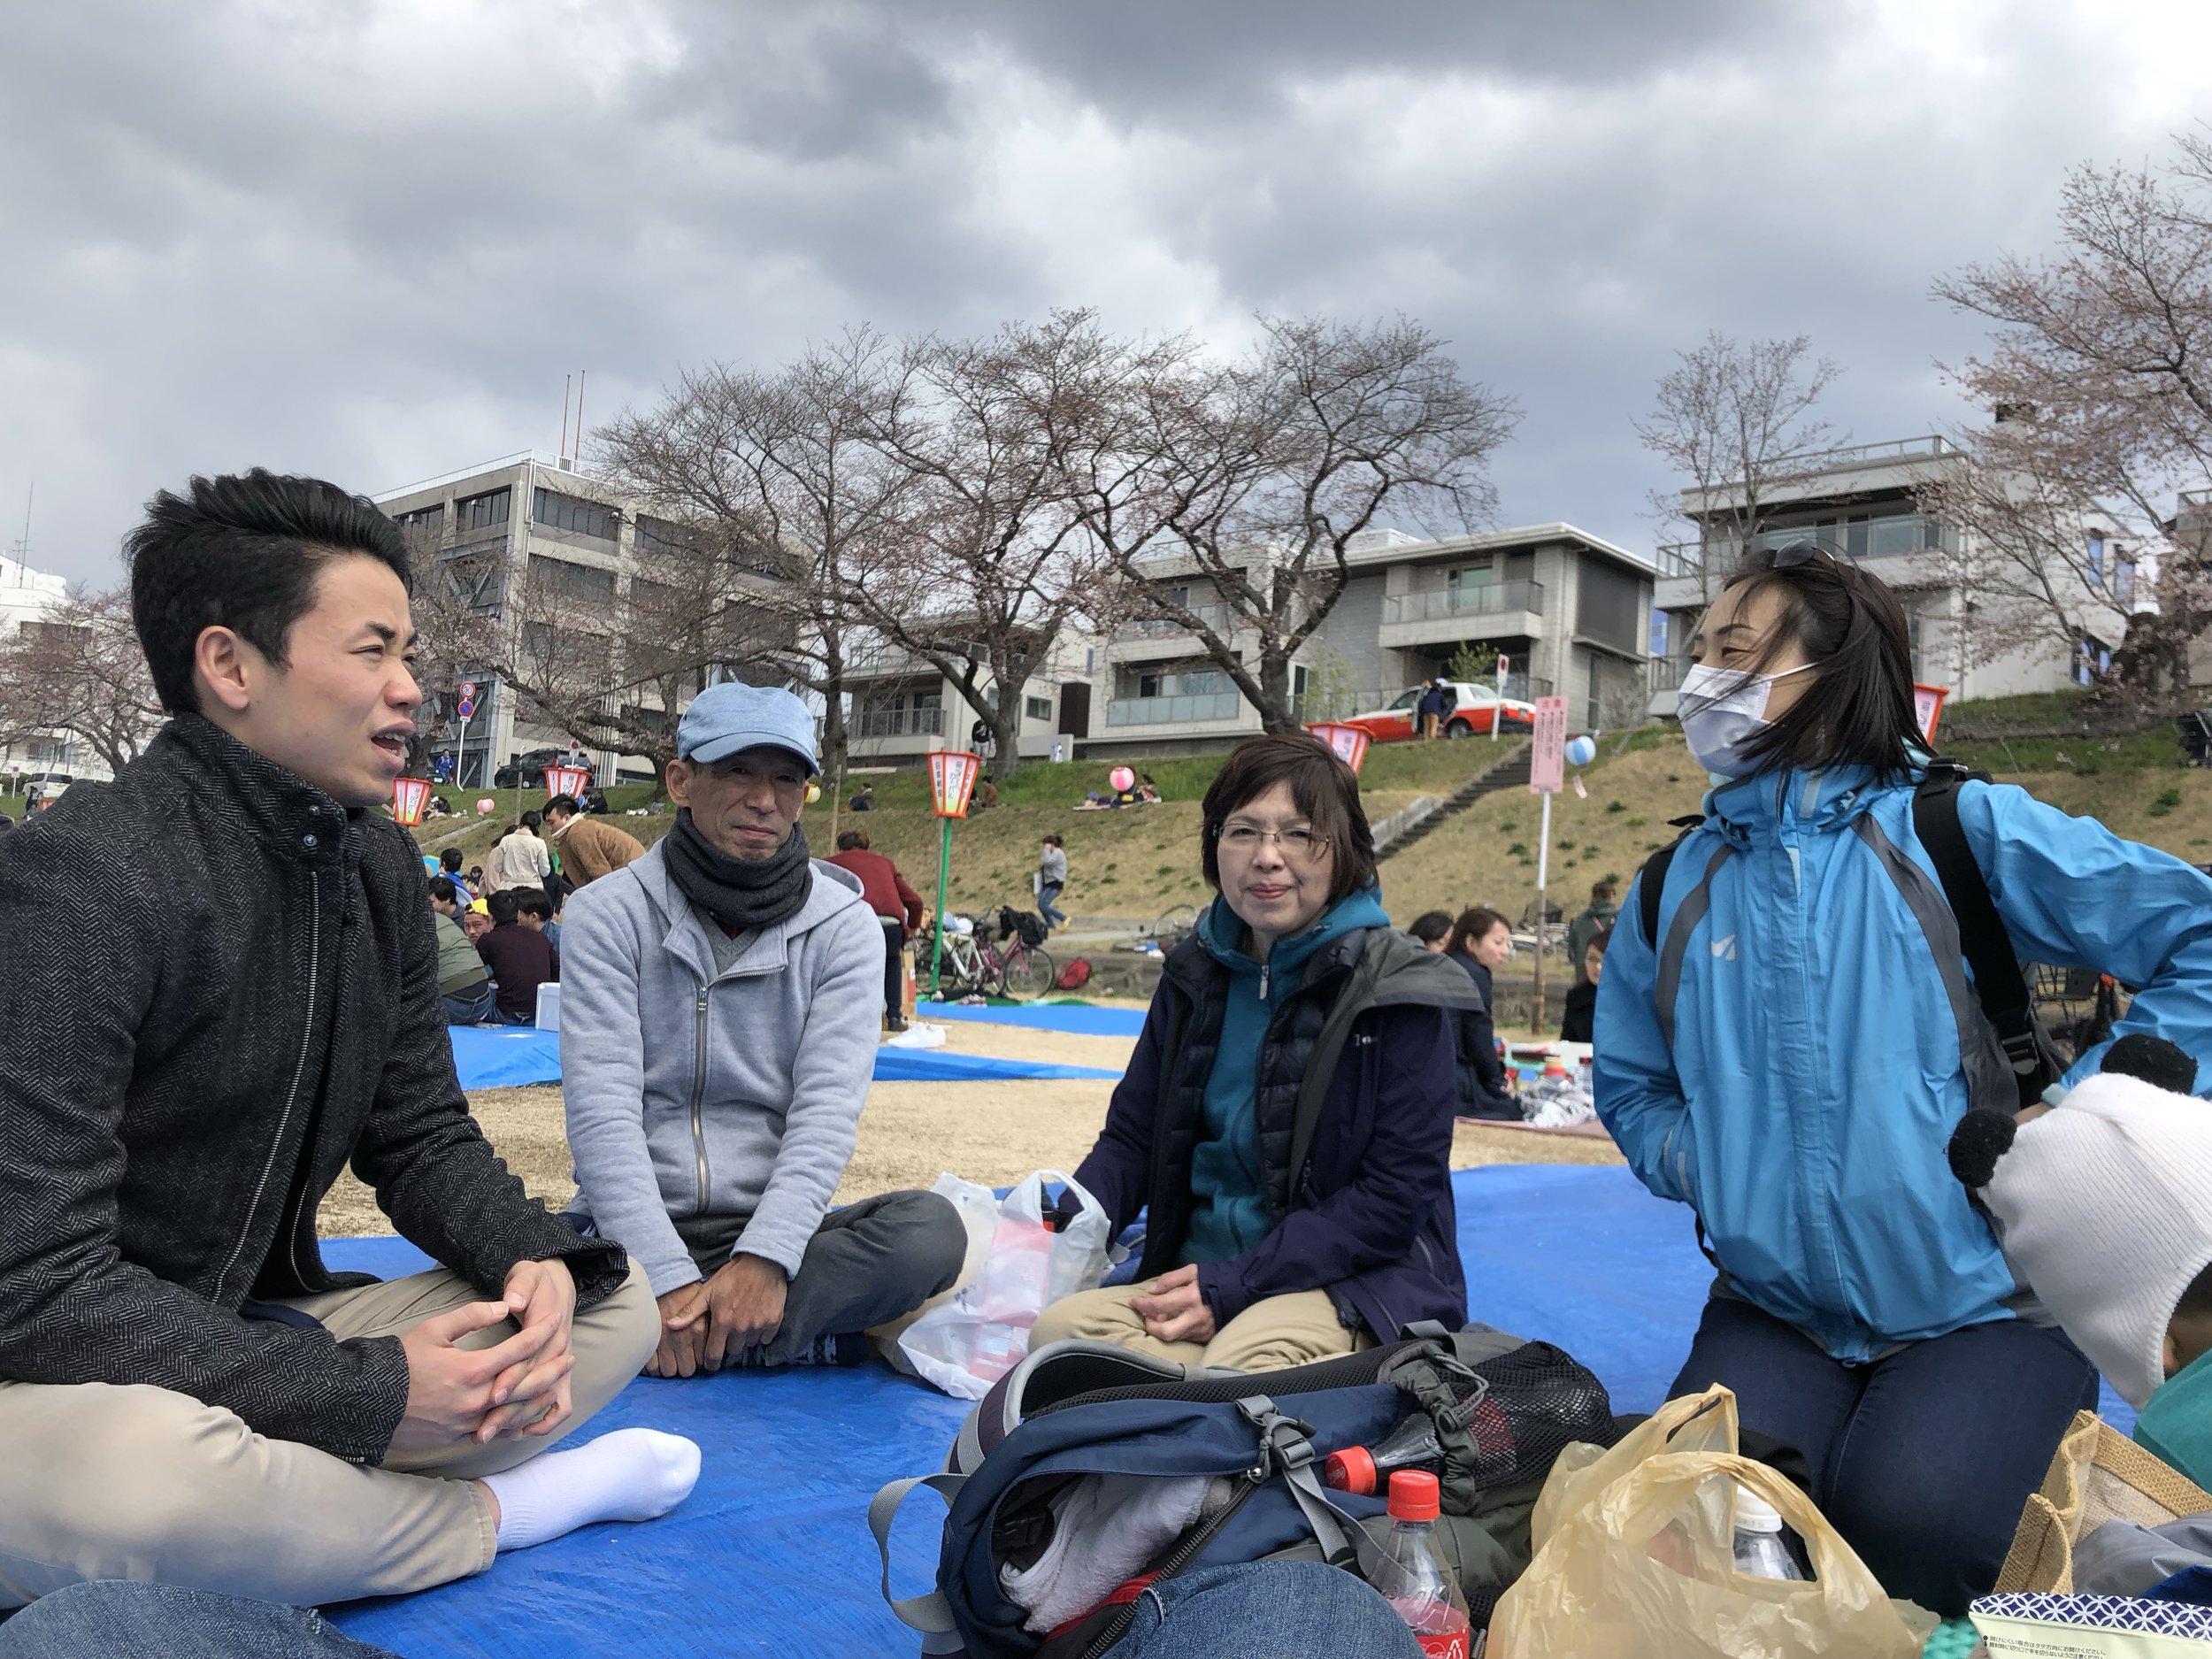 2019-03-31_13-13-29_IMG_8249.JPG